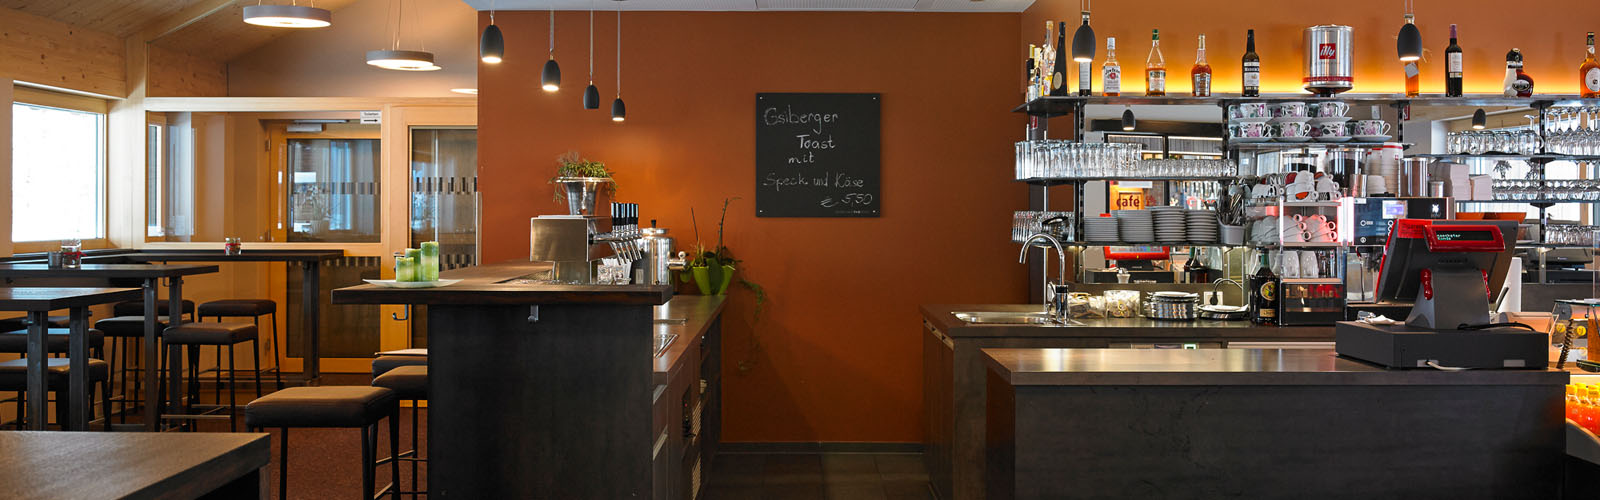 Sport Milanovic - Cafe und Kiosk am Sonnenkopf